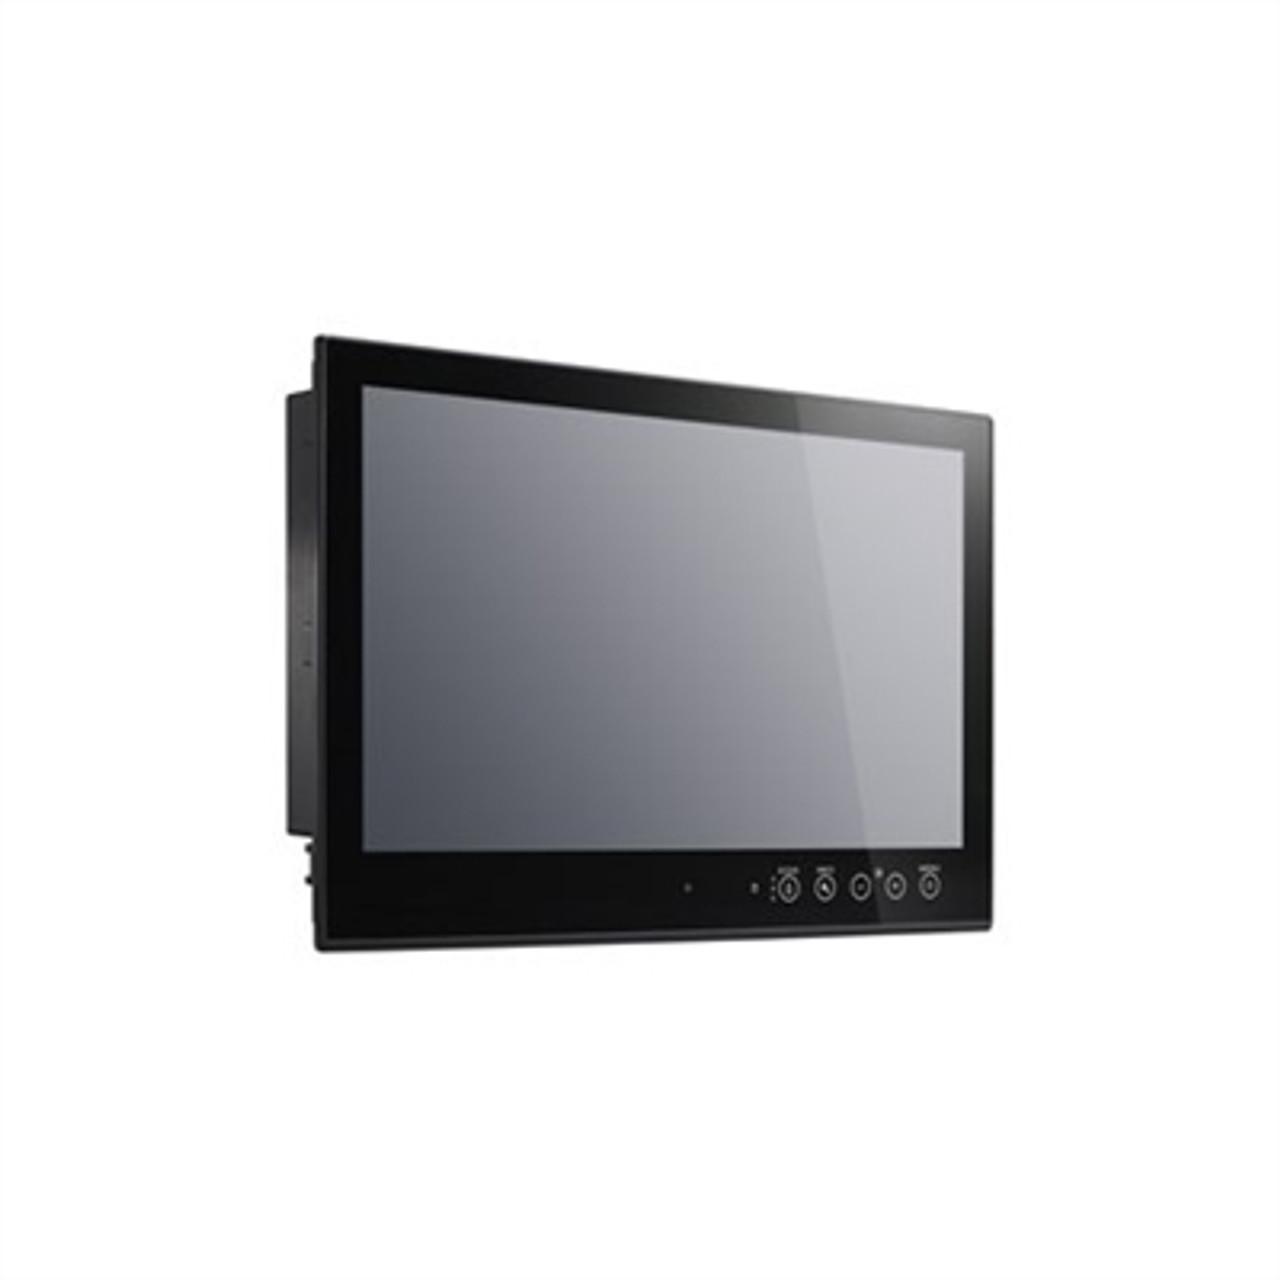 Moxa MPC-2240Z 24 Inch Fanless Panel Computer